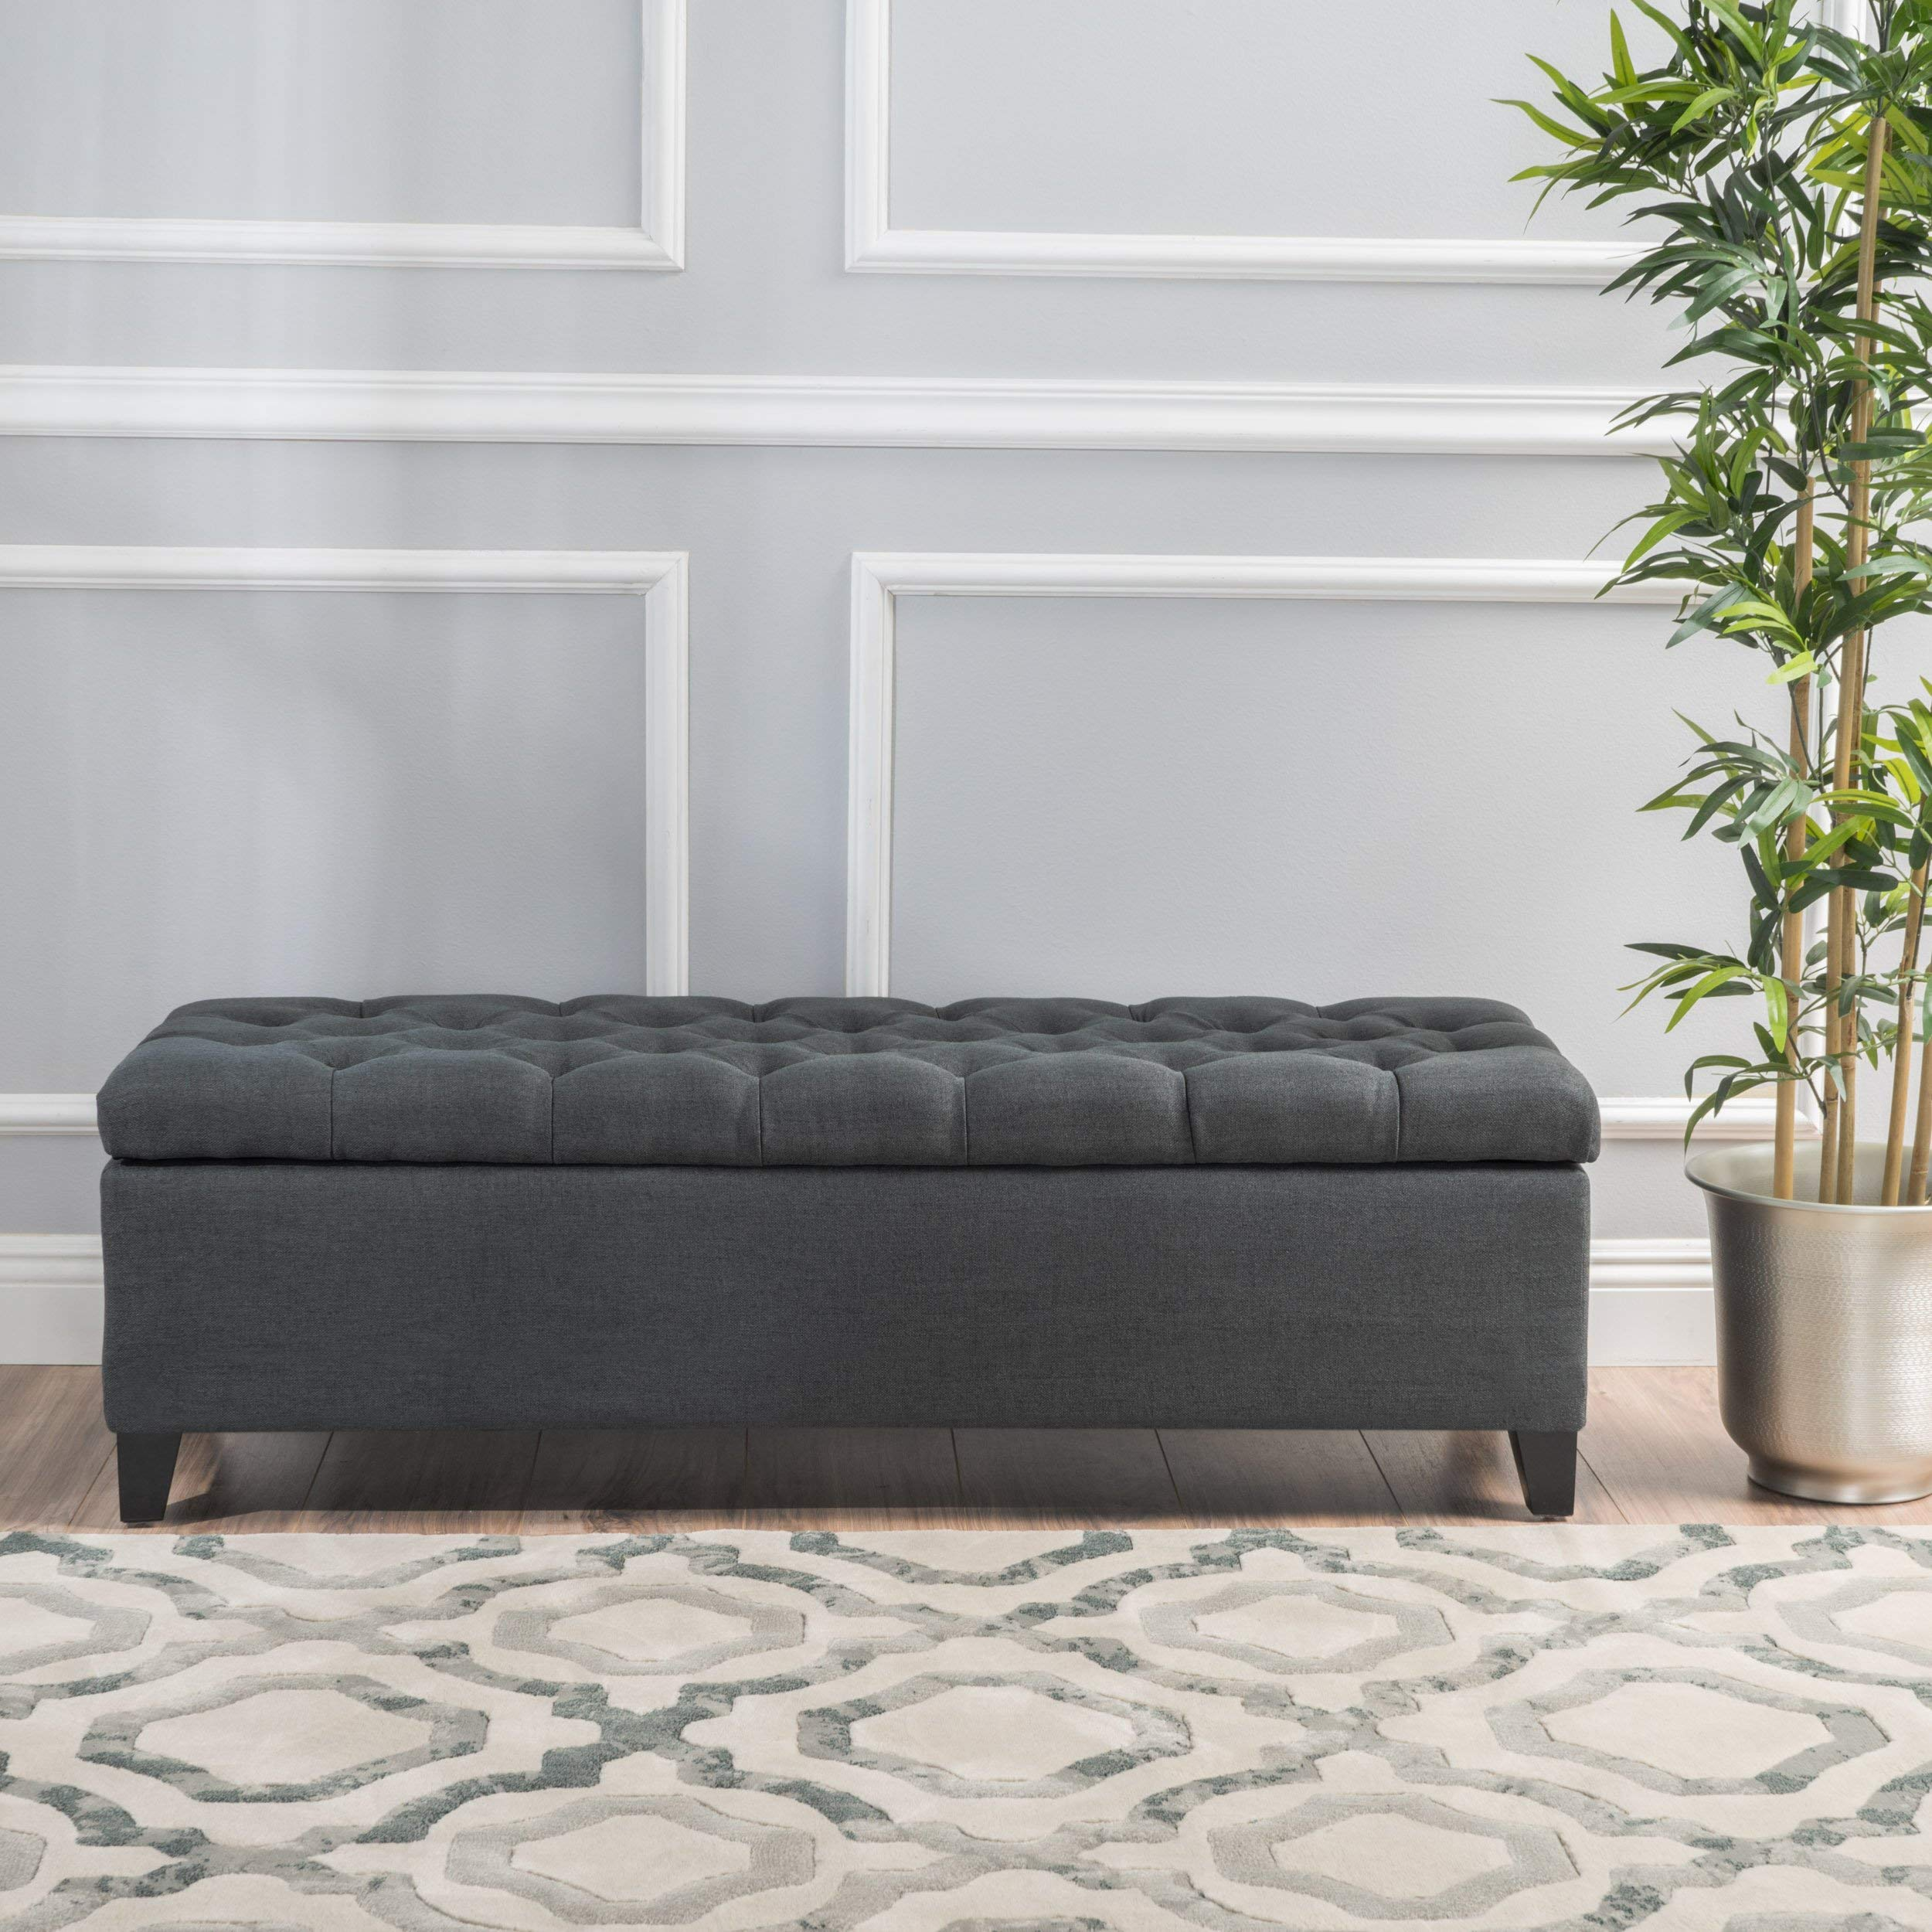 Christopher Knight Home Living Charleston Dark Grey Tufted Fabric Storage Ottoman, 17.75D x 51.50W x 15.75H by Christopher Knight Home